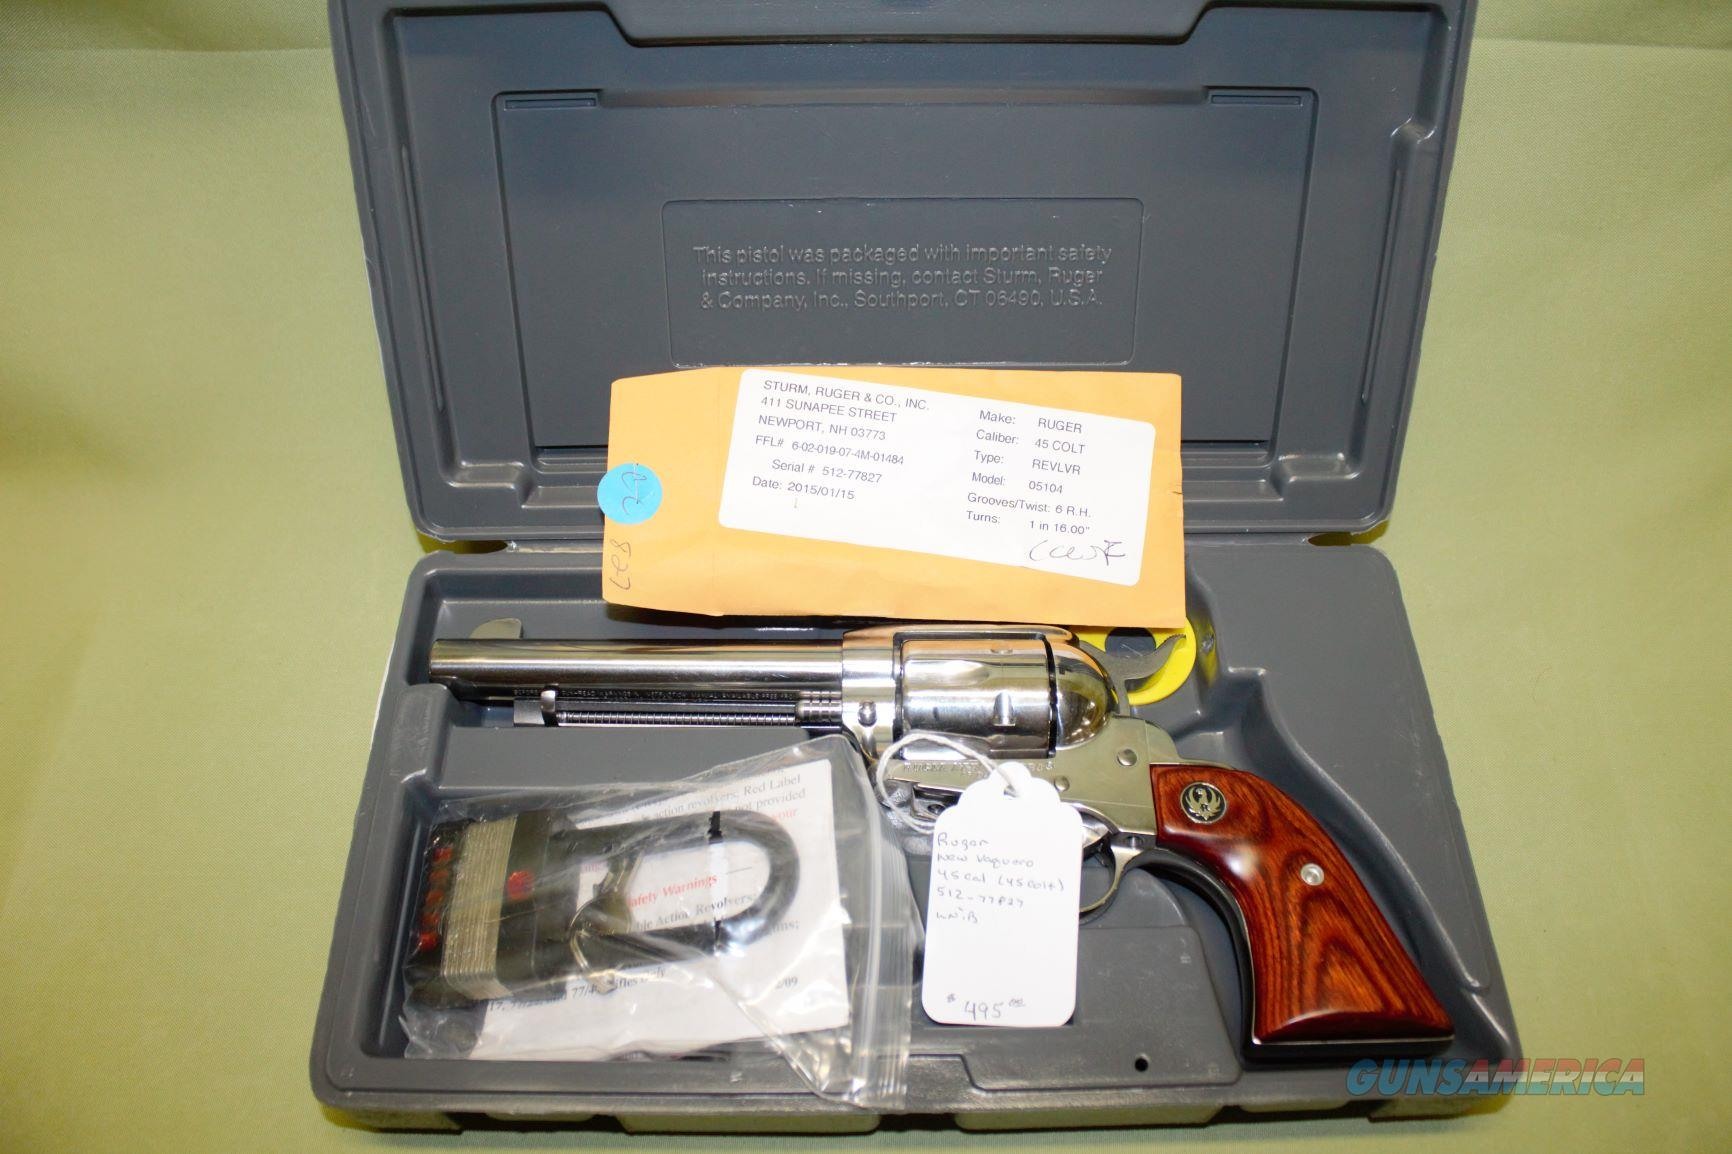 Ruger New Vaquero 45 Colt  Guns > Pistols > Ruger Single Action Revolvers > Cowboy Action